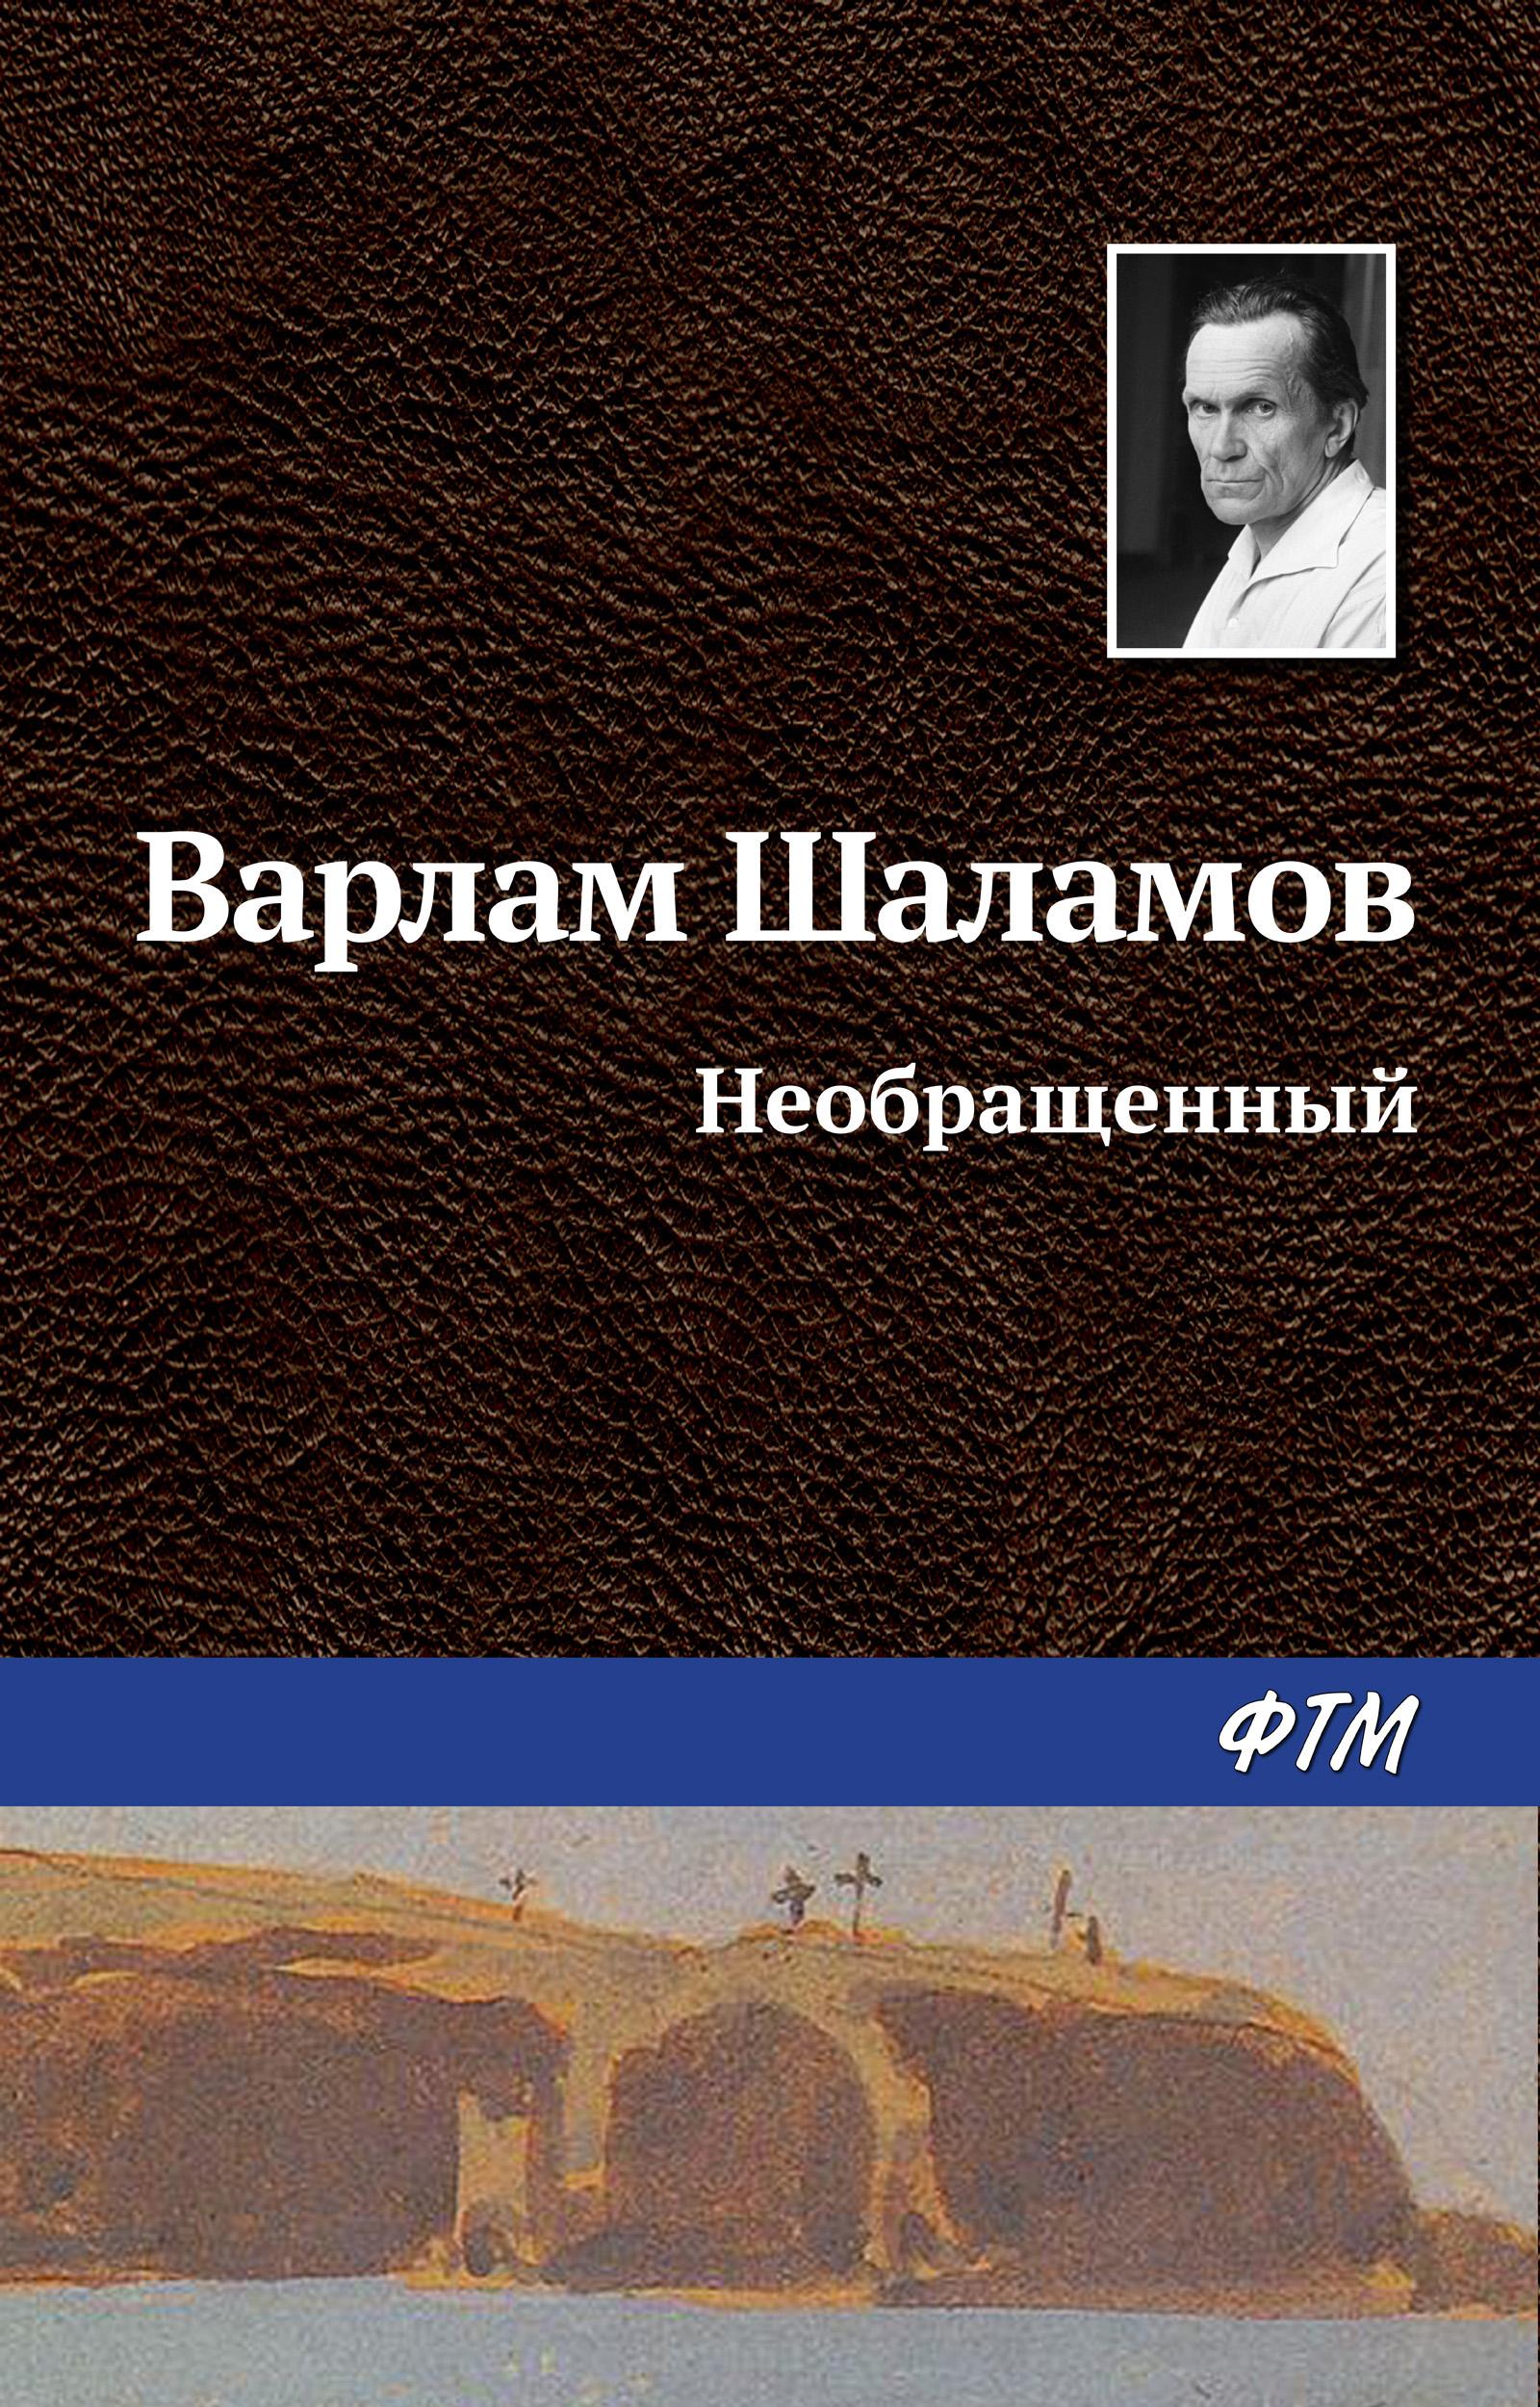 Варлам Шаламов Необращённый